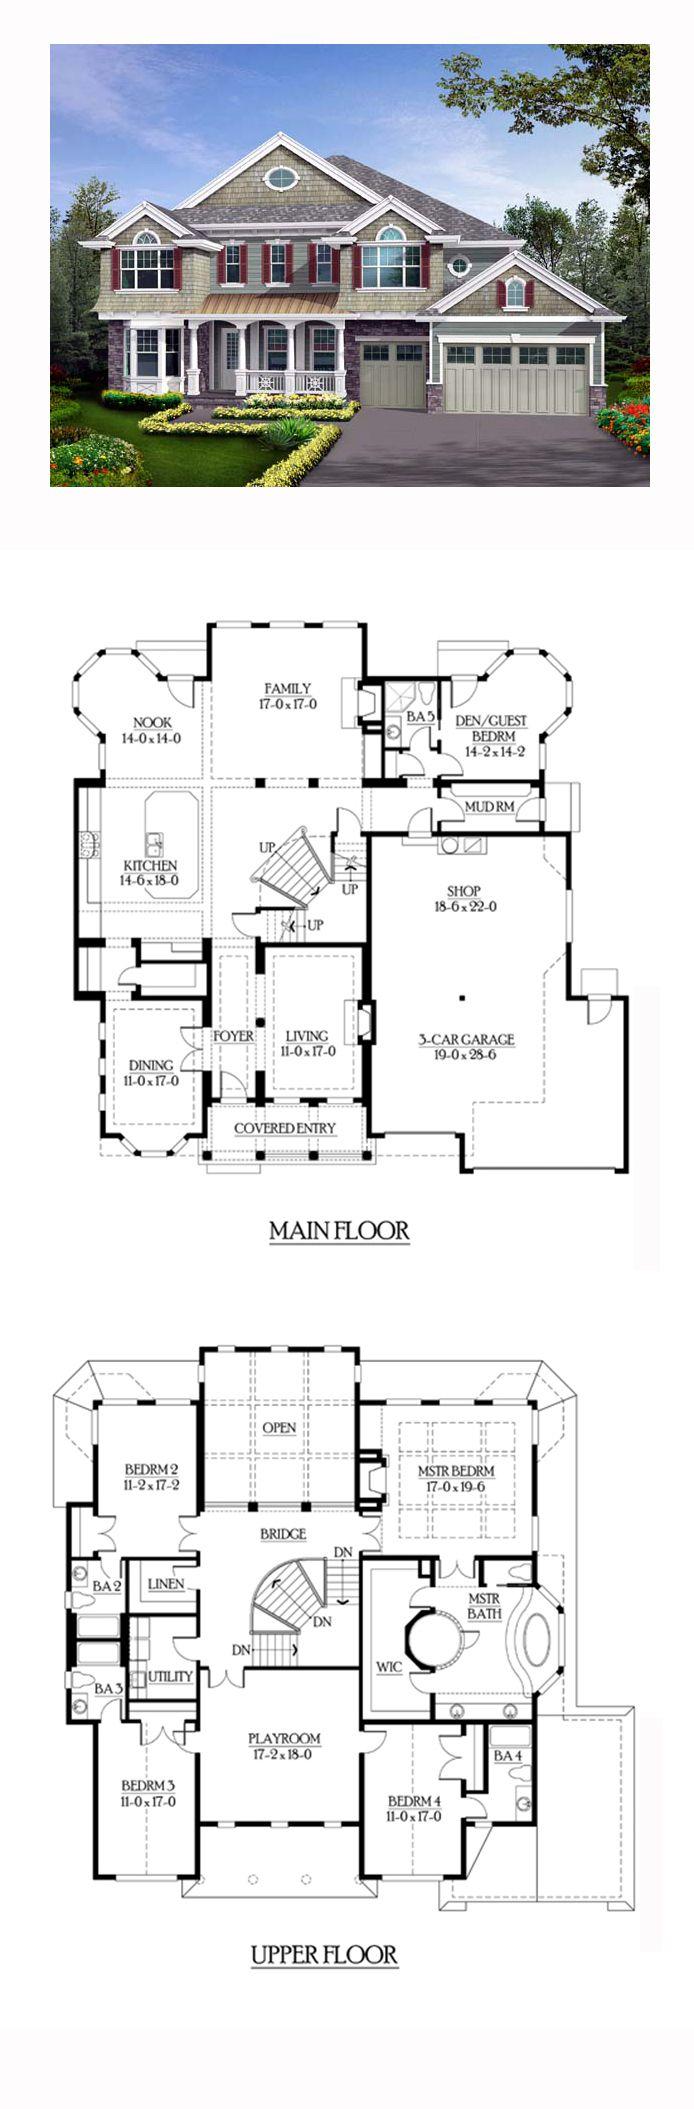 Pleasing 17 Best Ideas About House Blueprints On Pinterest House Floor Largest Home Design Picture Inspirations Pitcheantrous